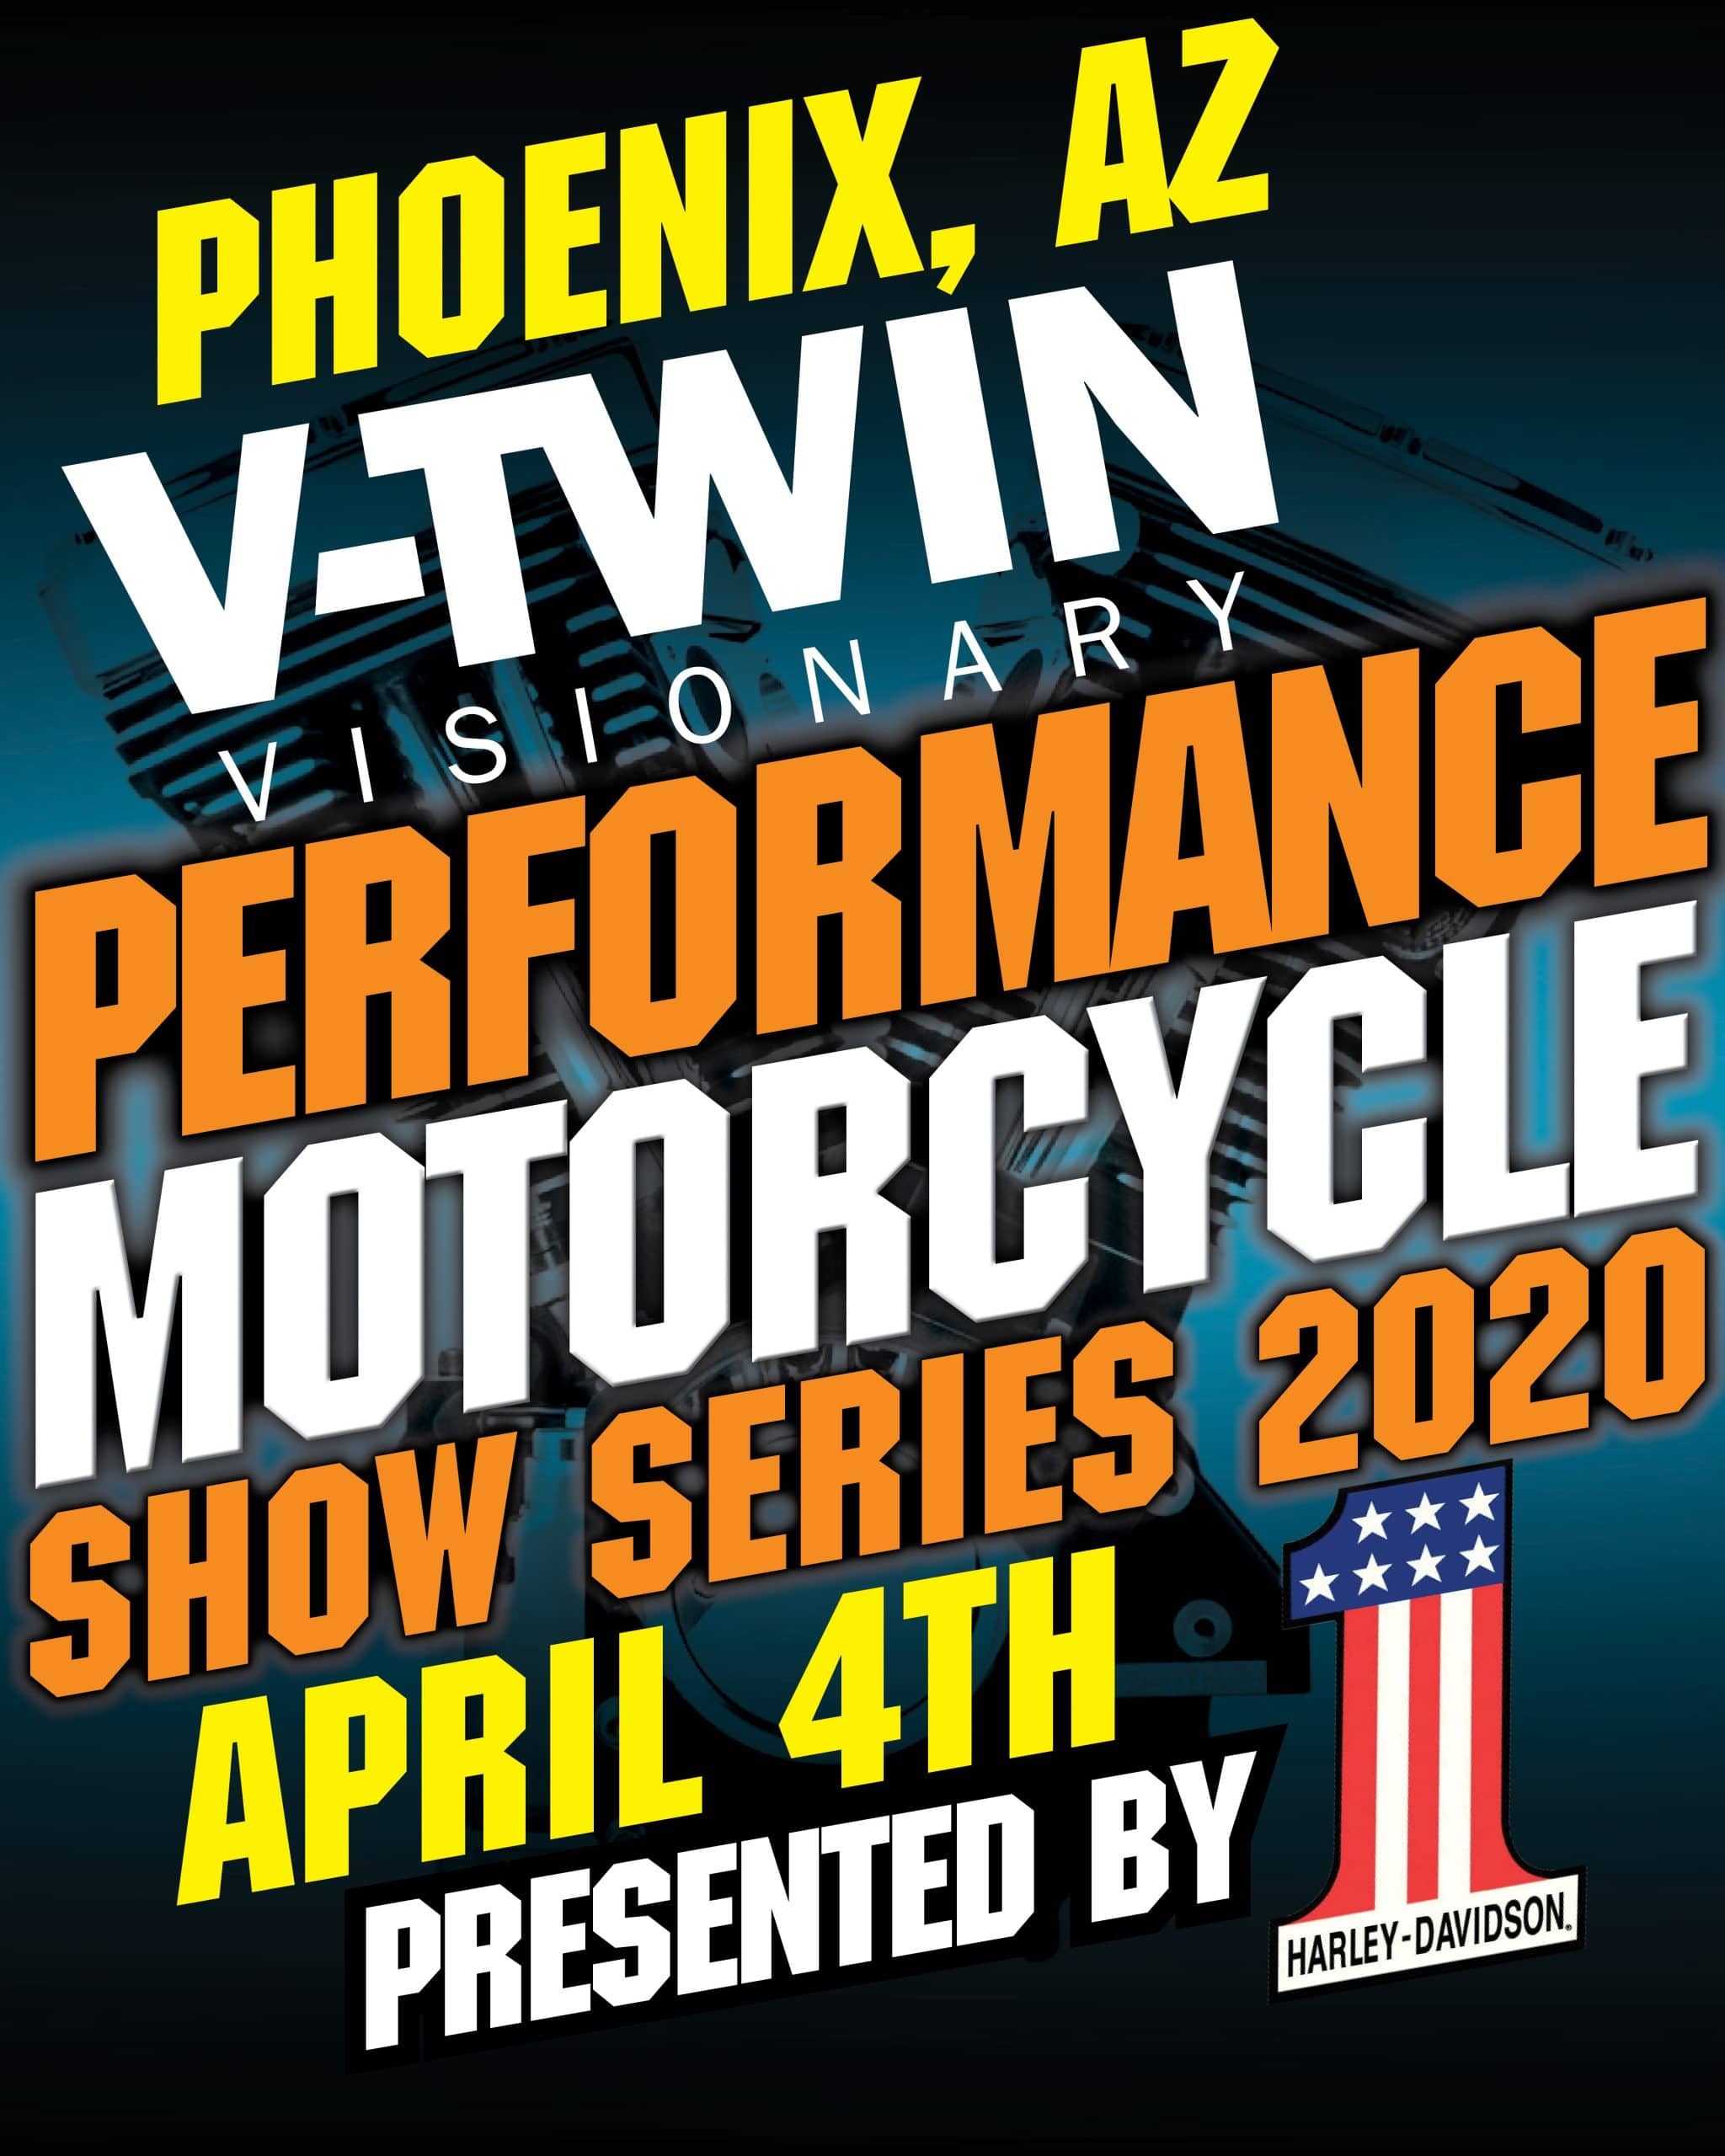 vtwin visionary vtv phoenix motorcycle show